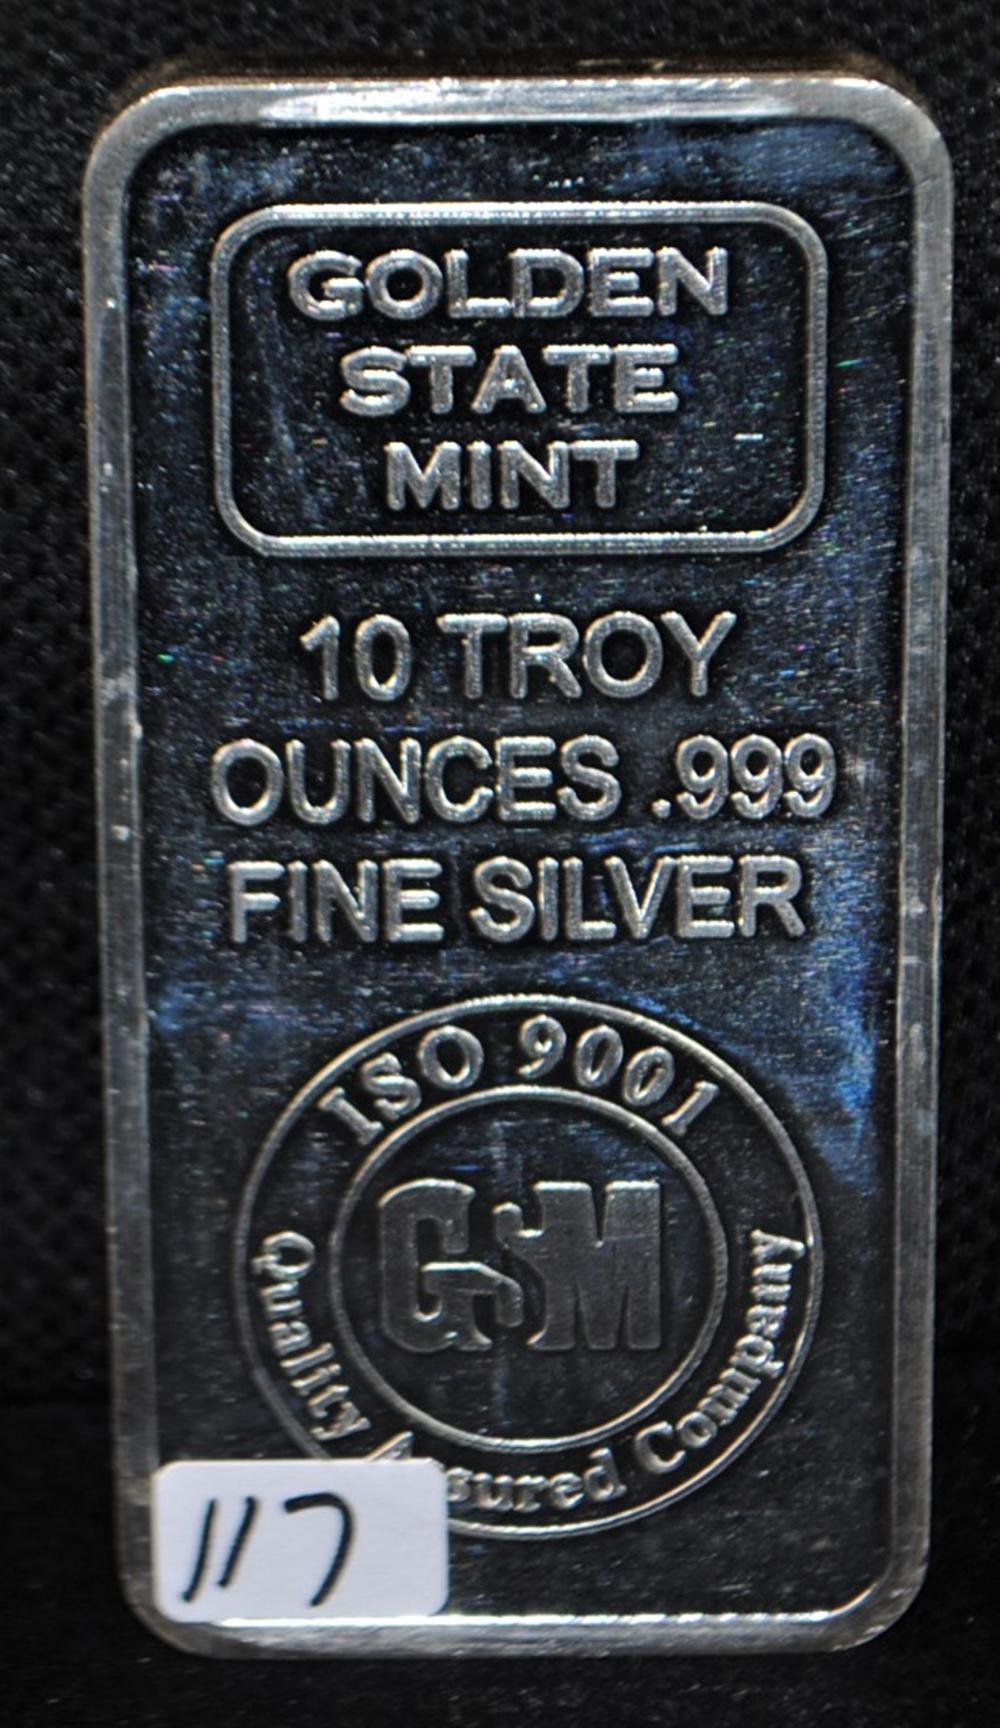 Golden State Mint 10 Troy Oz 999 Fine Silver Bar